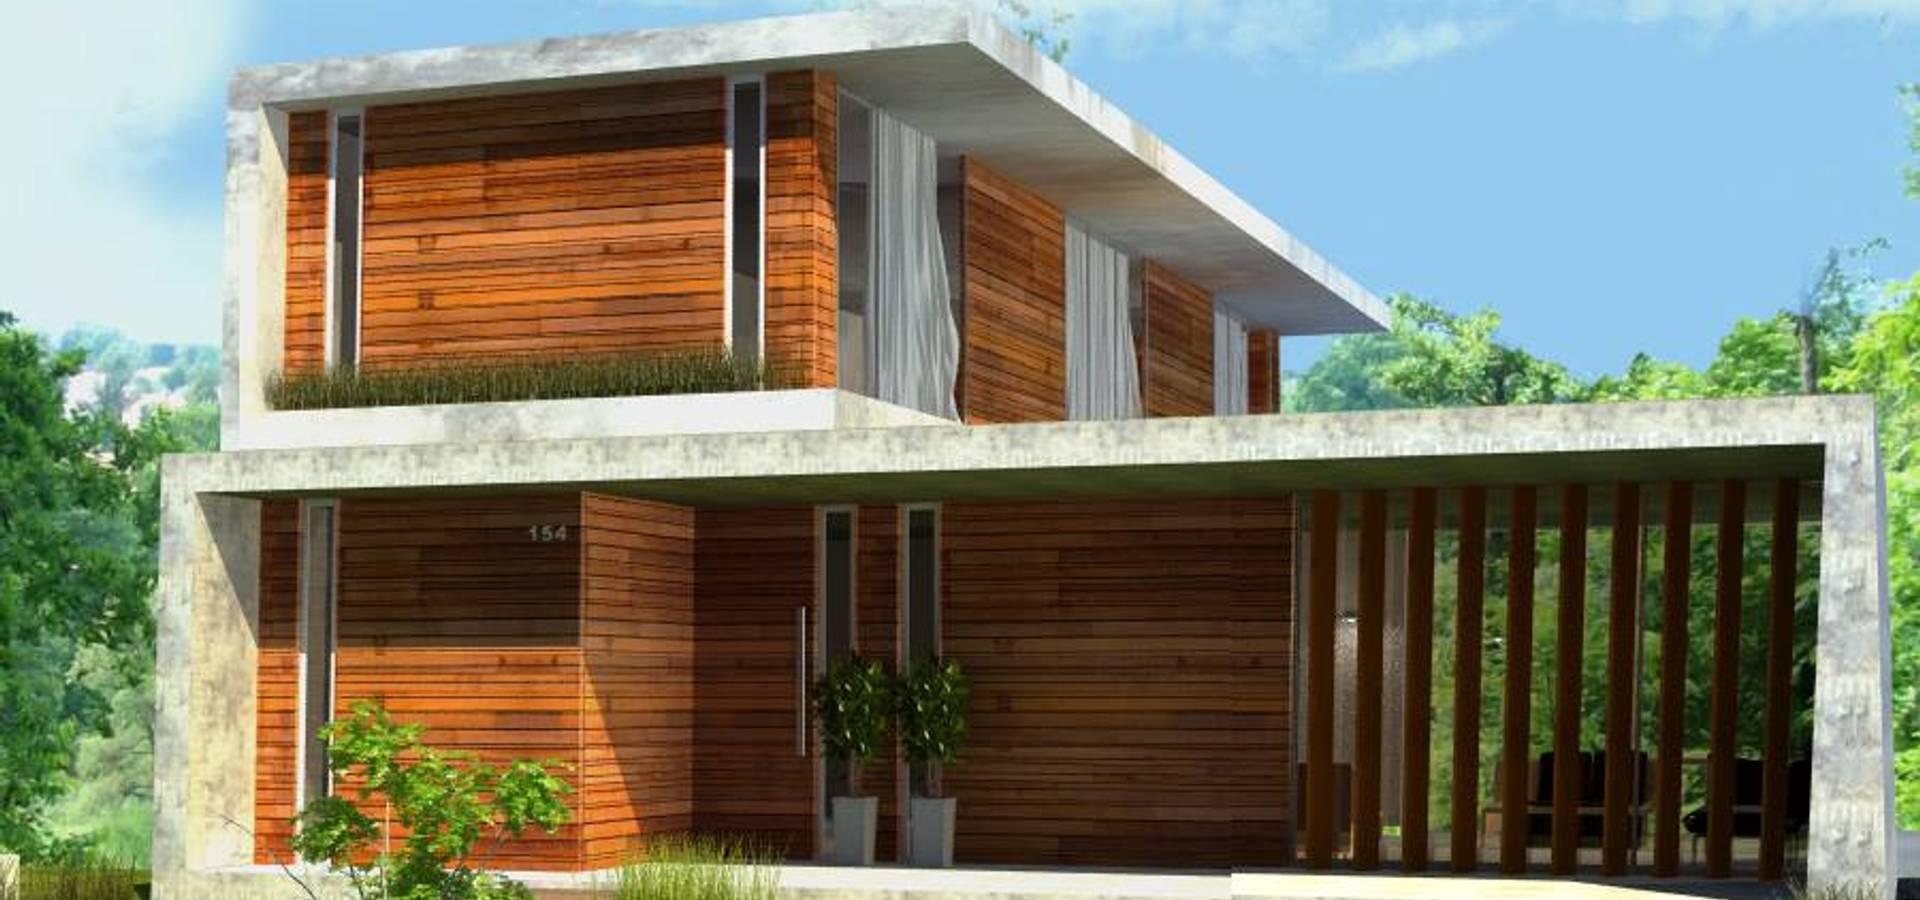 Arq magdalena saravia estudio de arquitectura - Arquitectos en cordoba ...